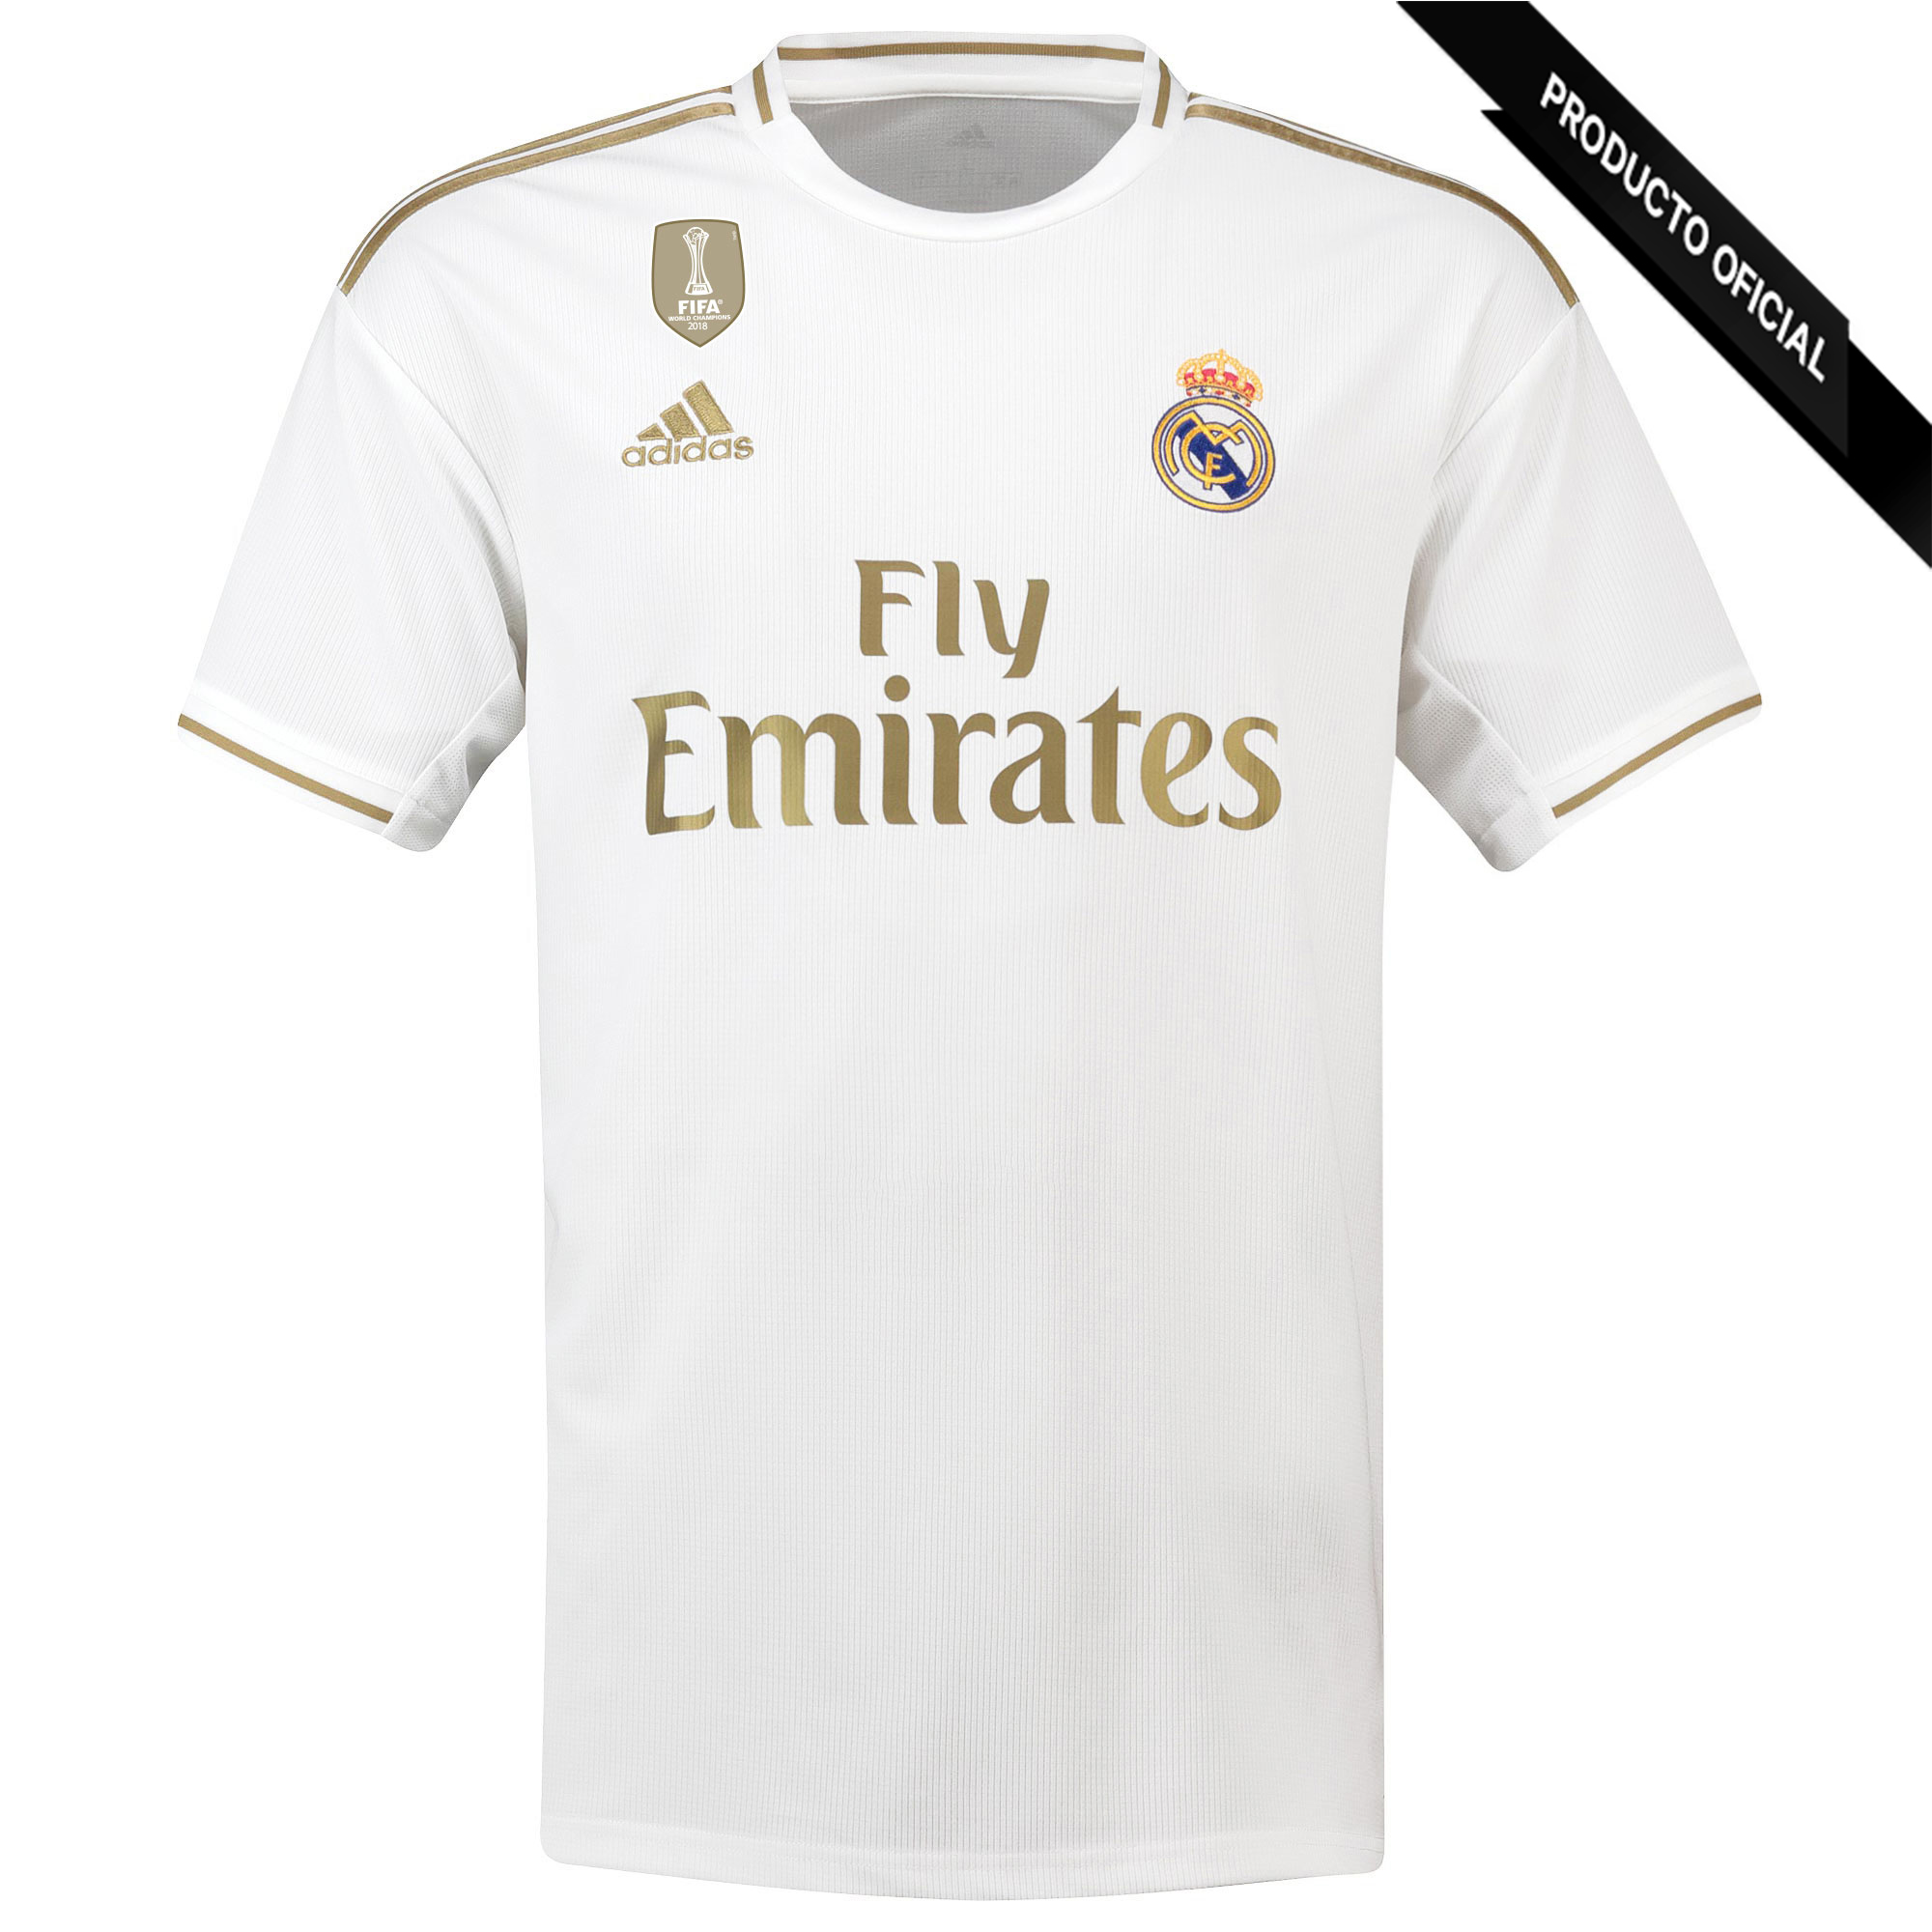 ADIDAS T le 1 'away Real Madrid 2019-20 couleur blanc et or Dorsal danger football vêtements marque officiel